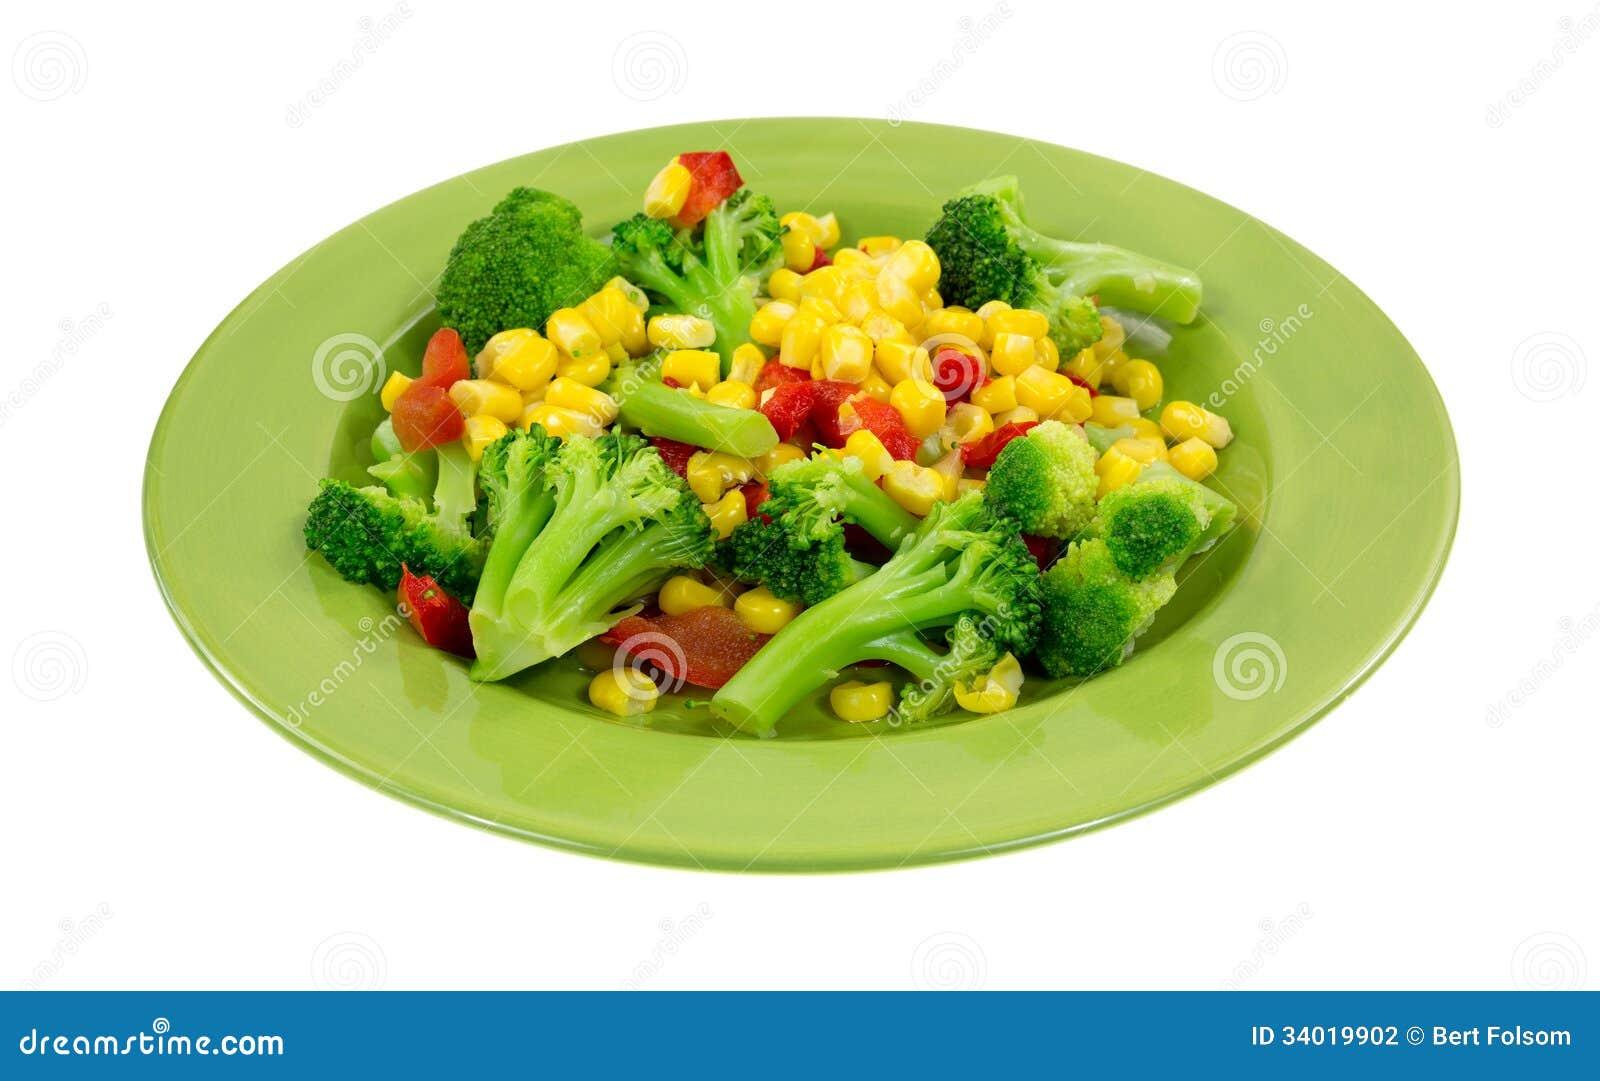 veg chinese food